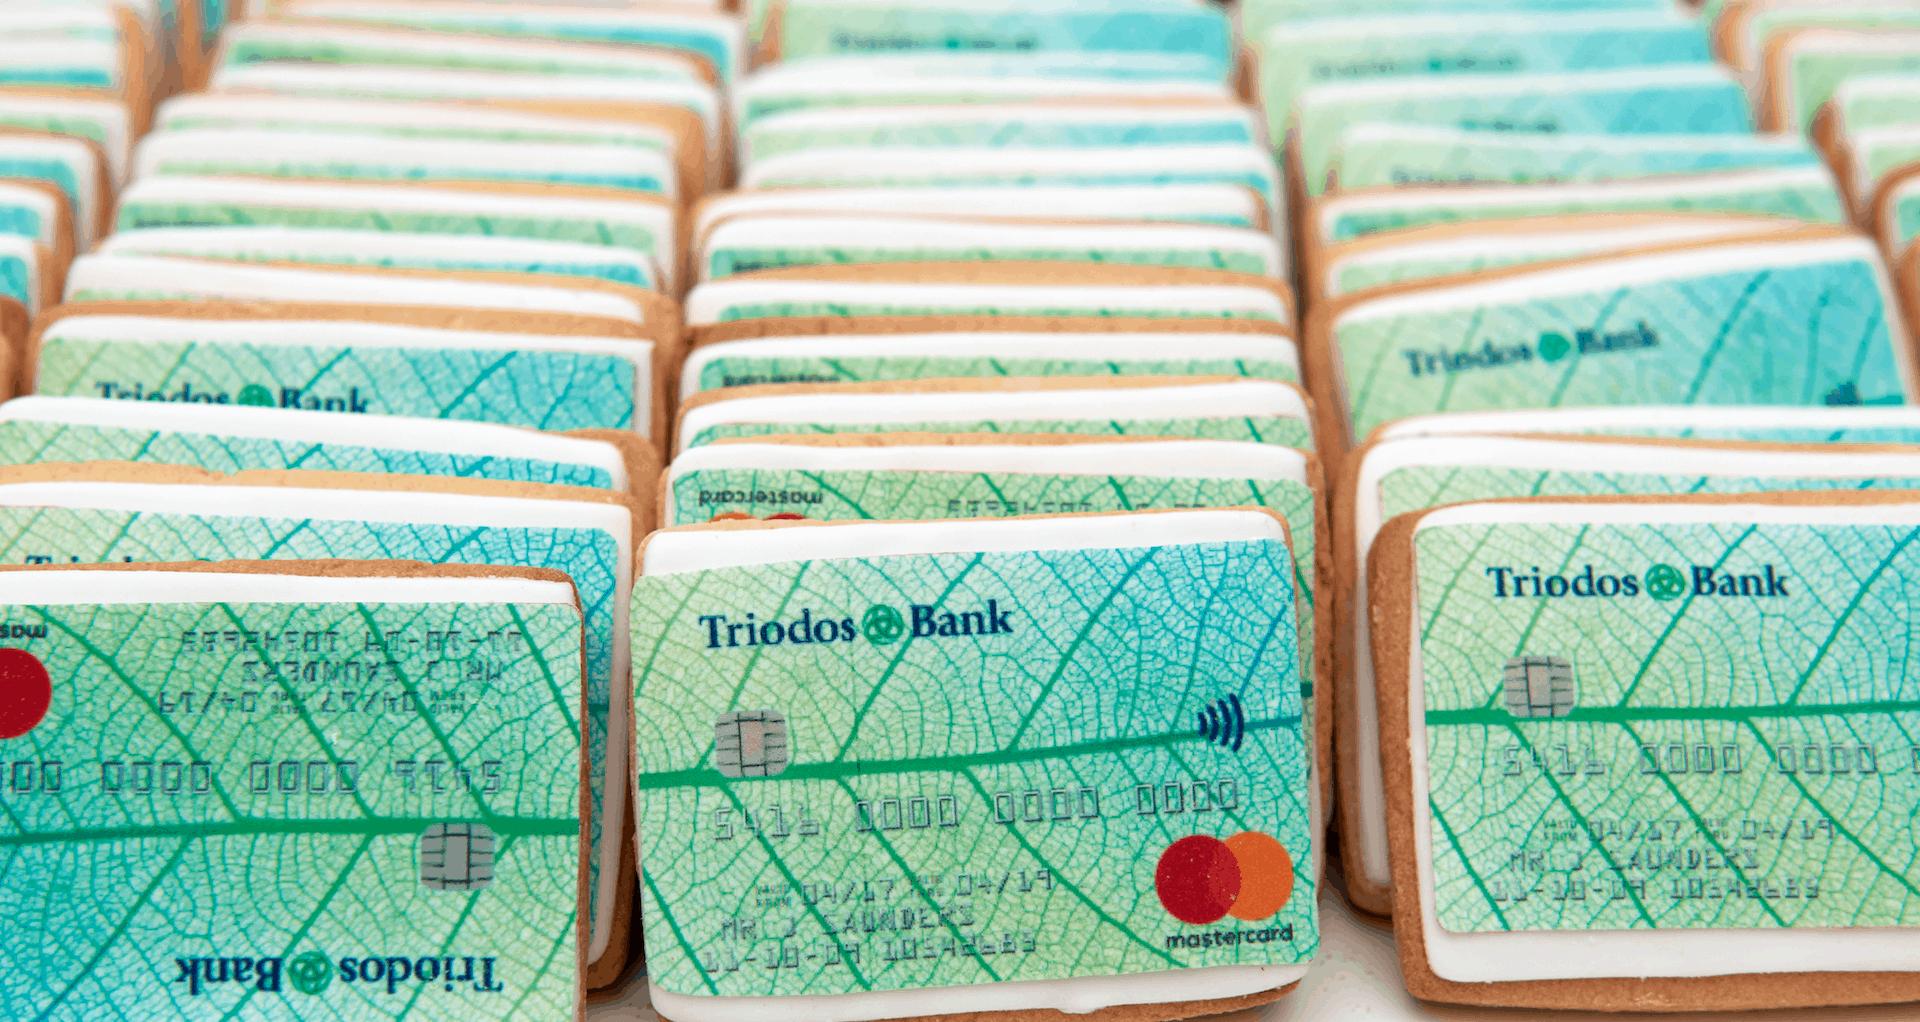 Triodos bank review